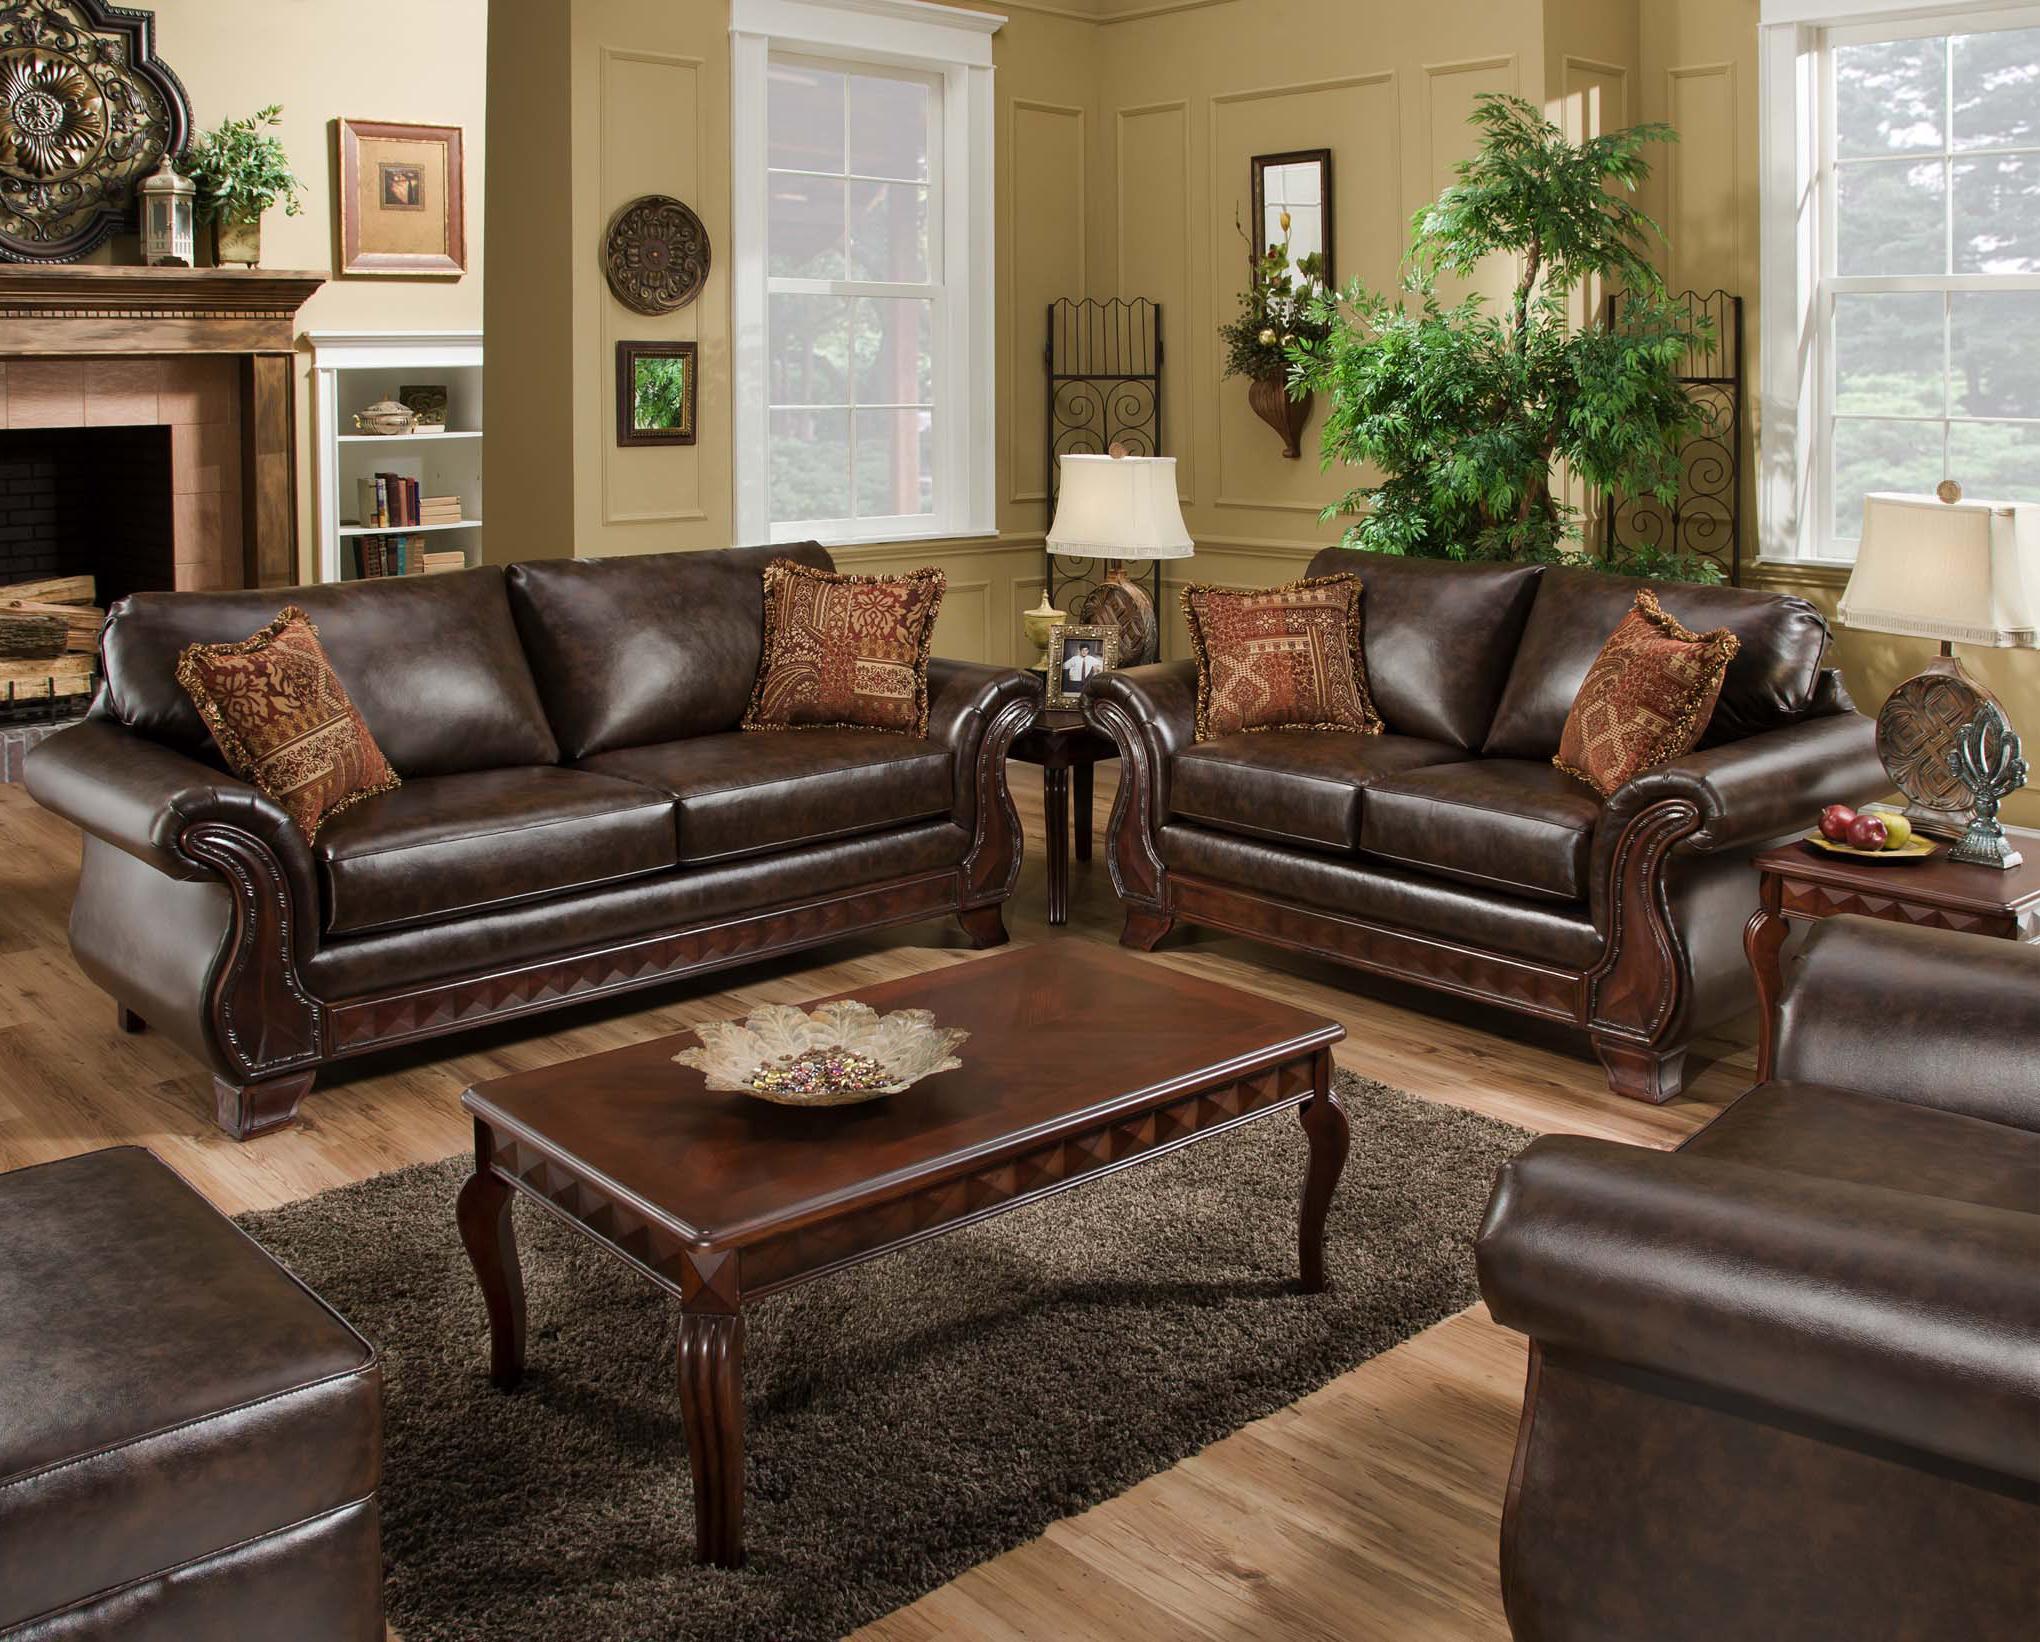 American Furniture 6900 Stationary Living Room Group Prime Brothers Furniture Stationary